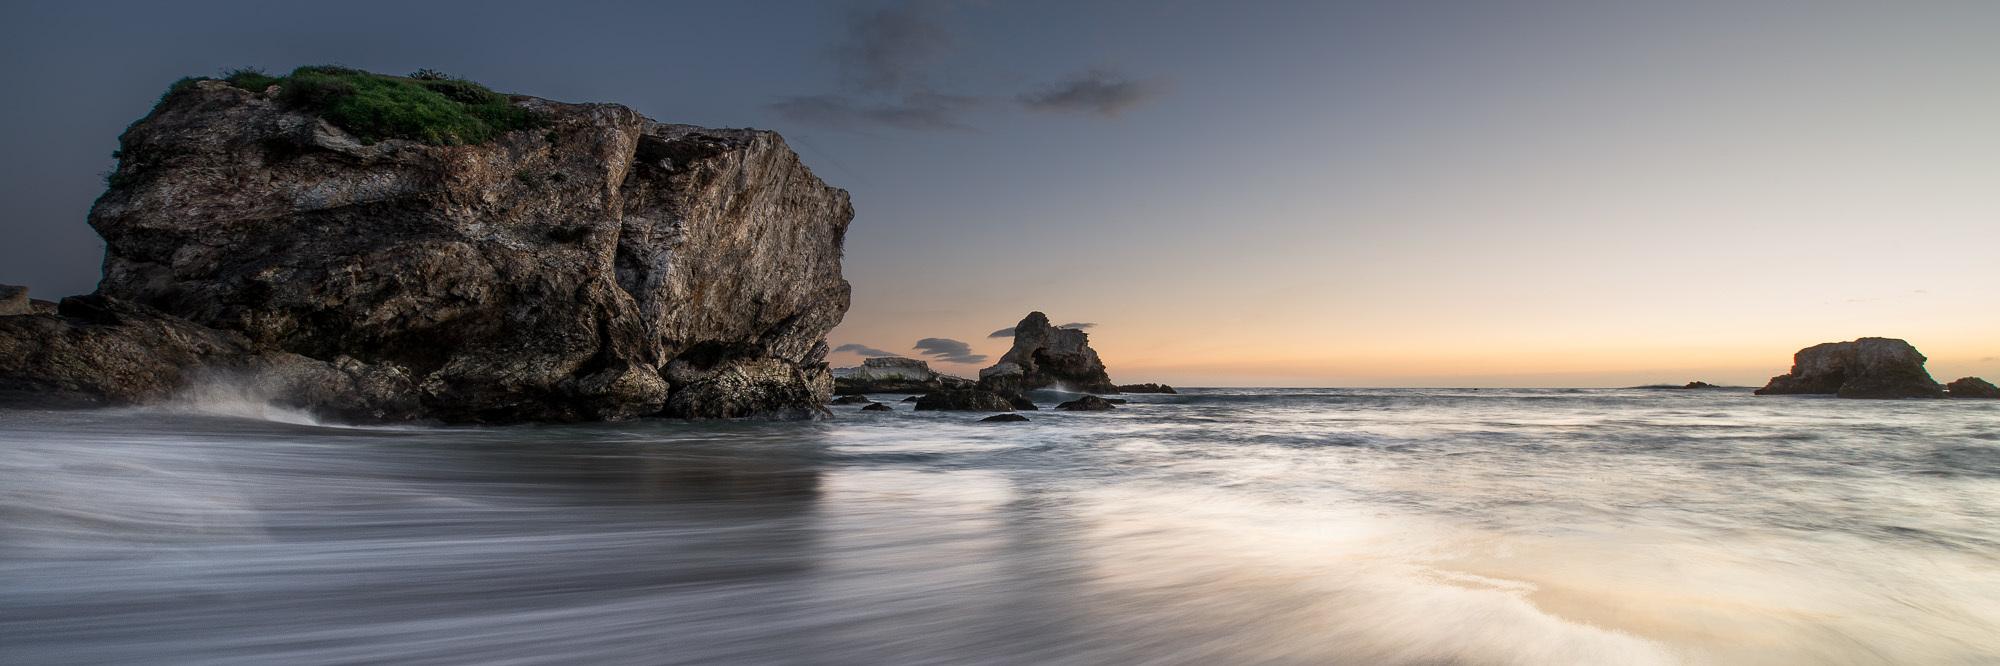 20130126_Shell Beach_3657_Edit.jpg